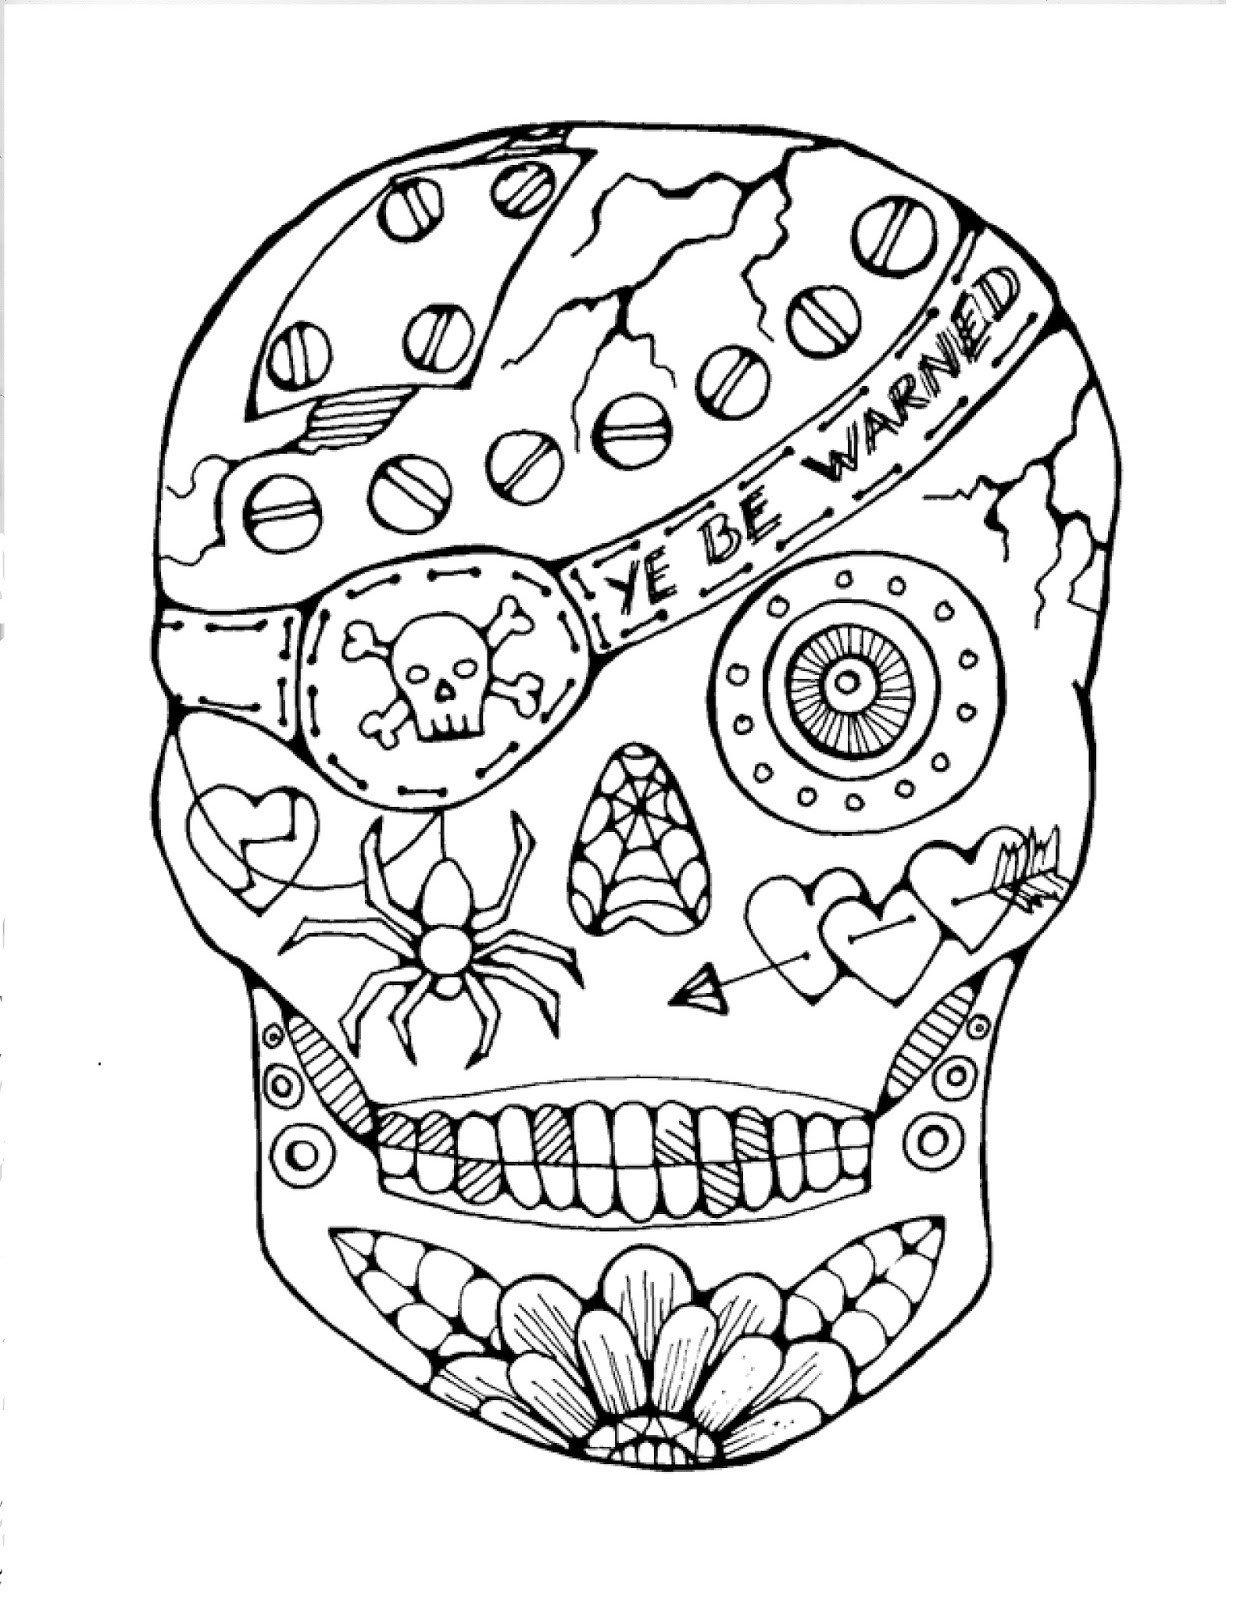 Sugar Skull Drawing Template Sugar Skull Drawing Template at Getdrawings